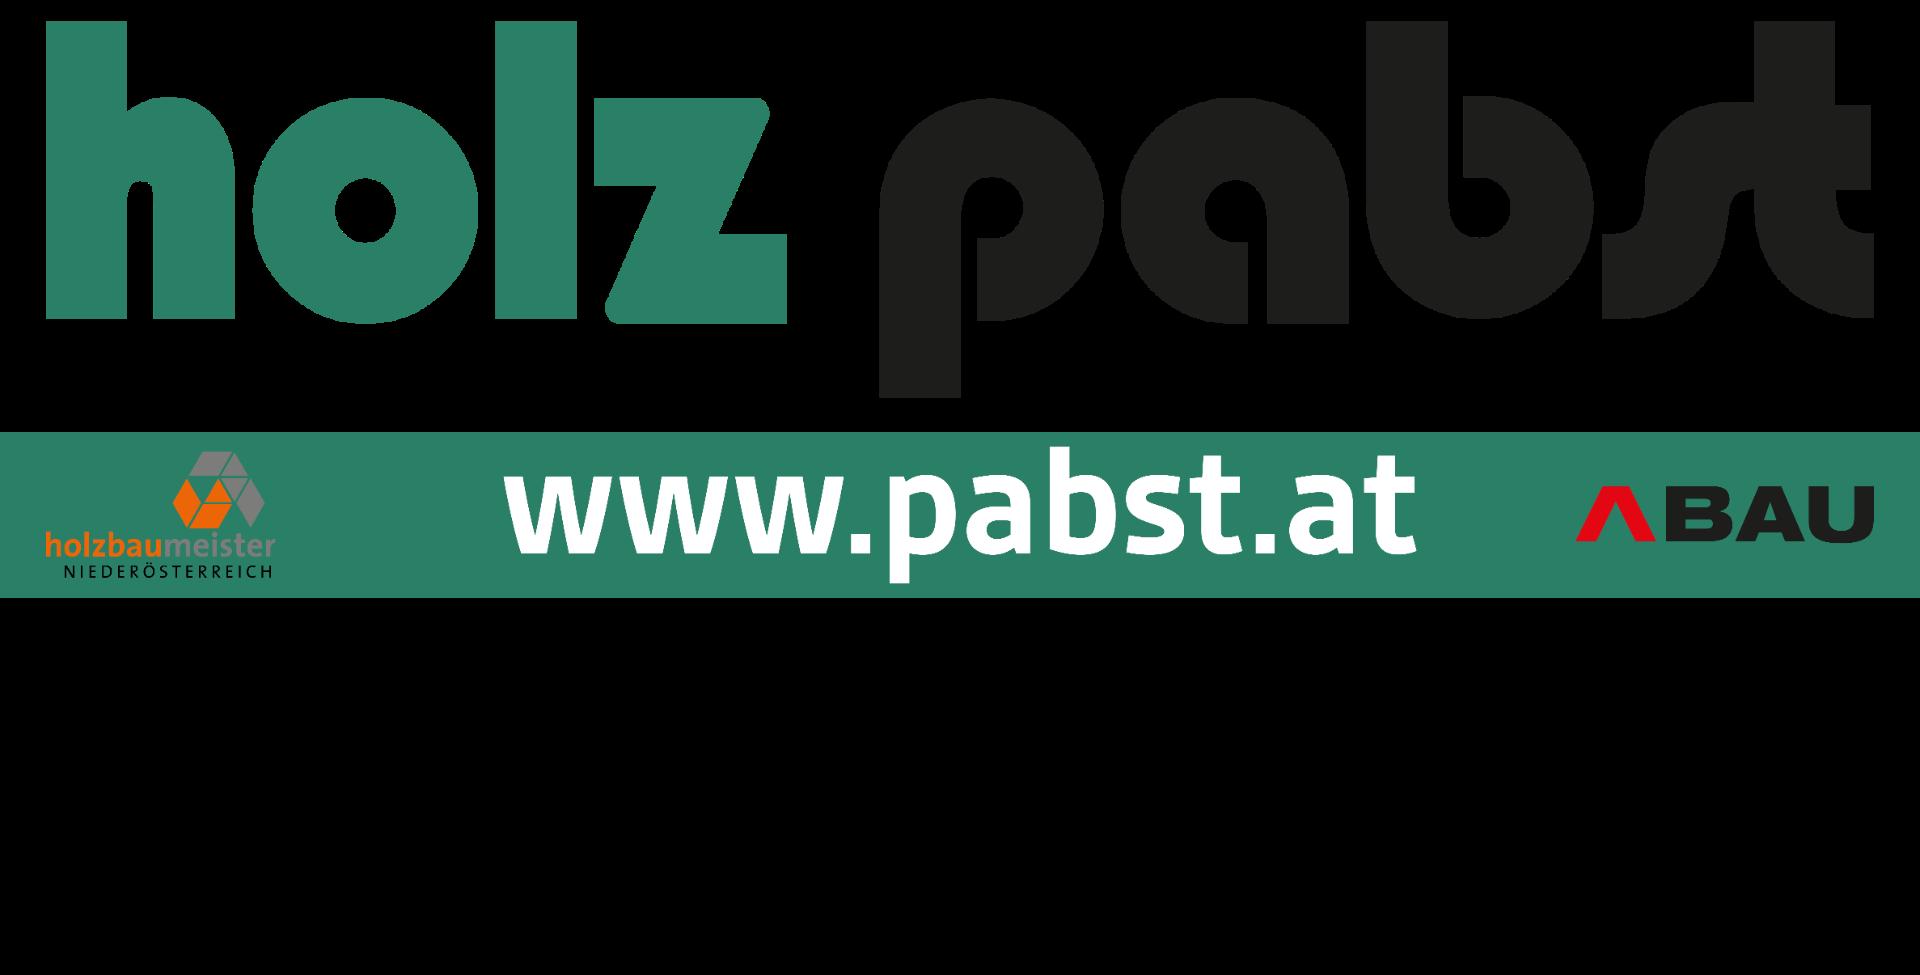 Holz PabstNEU.png